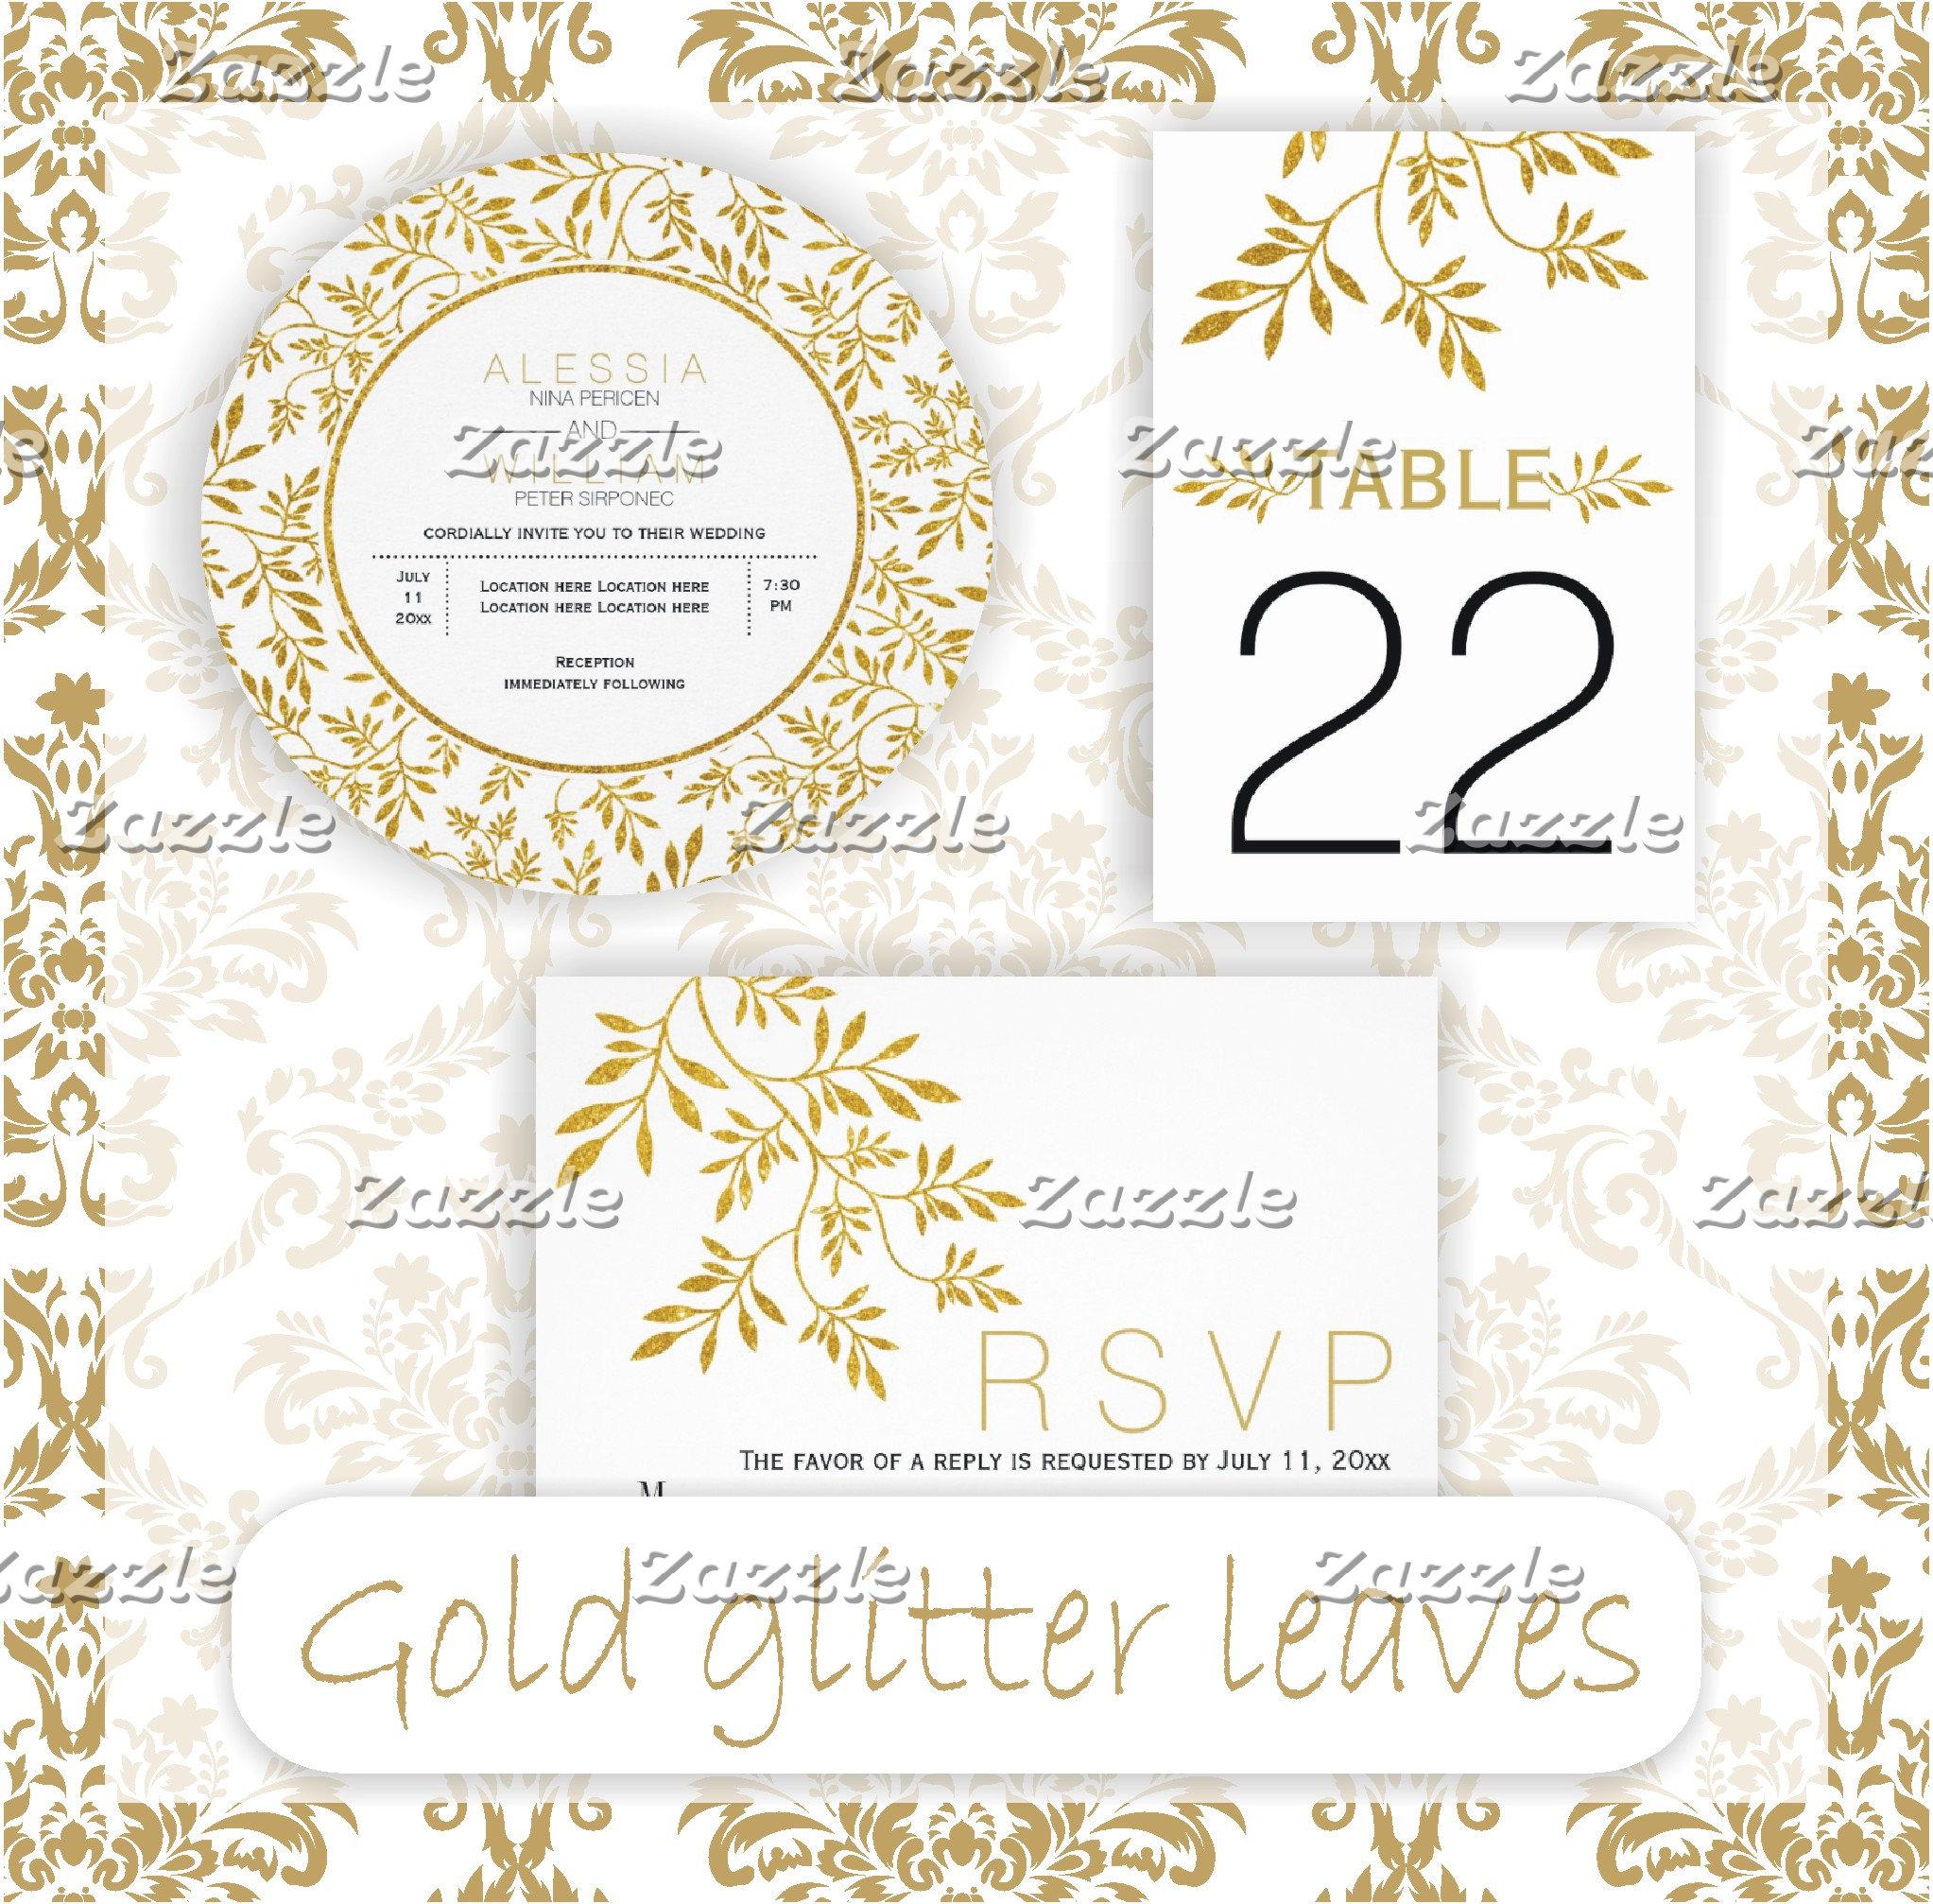 Gold foil or glitter